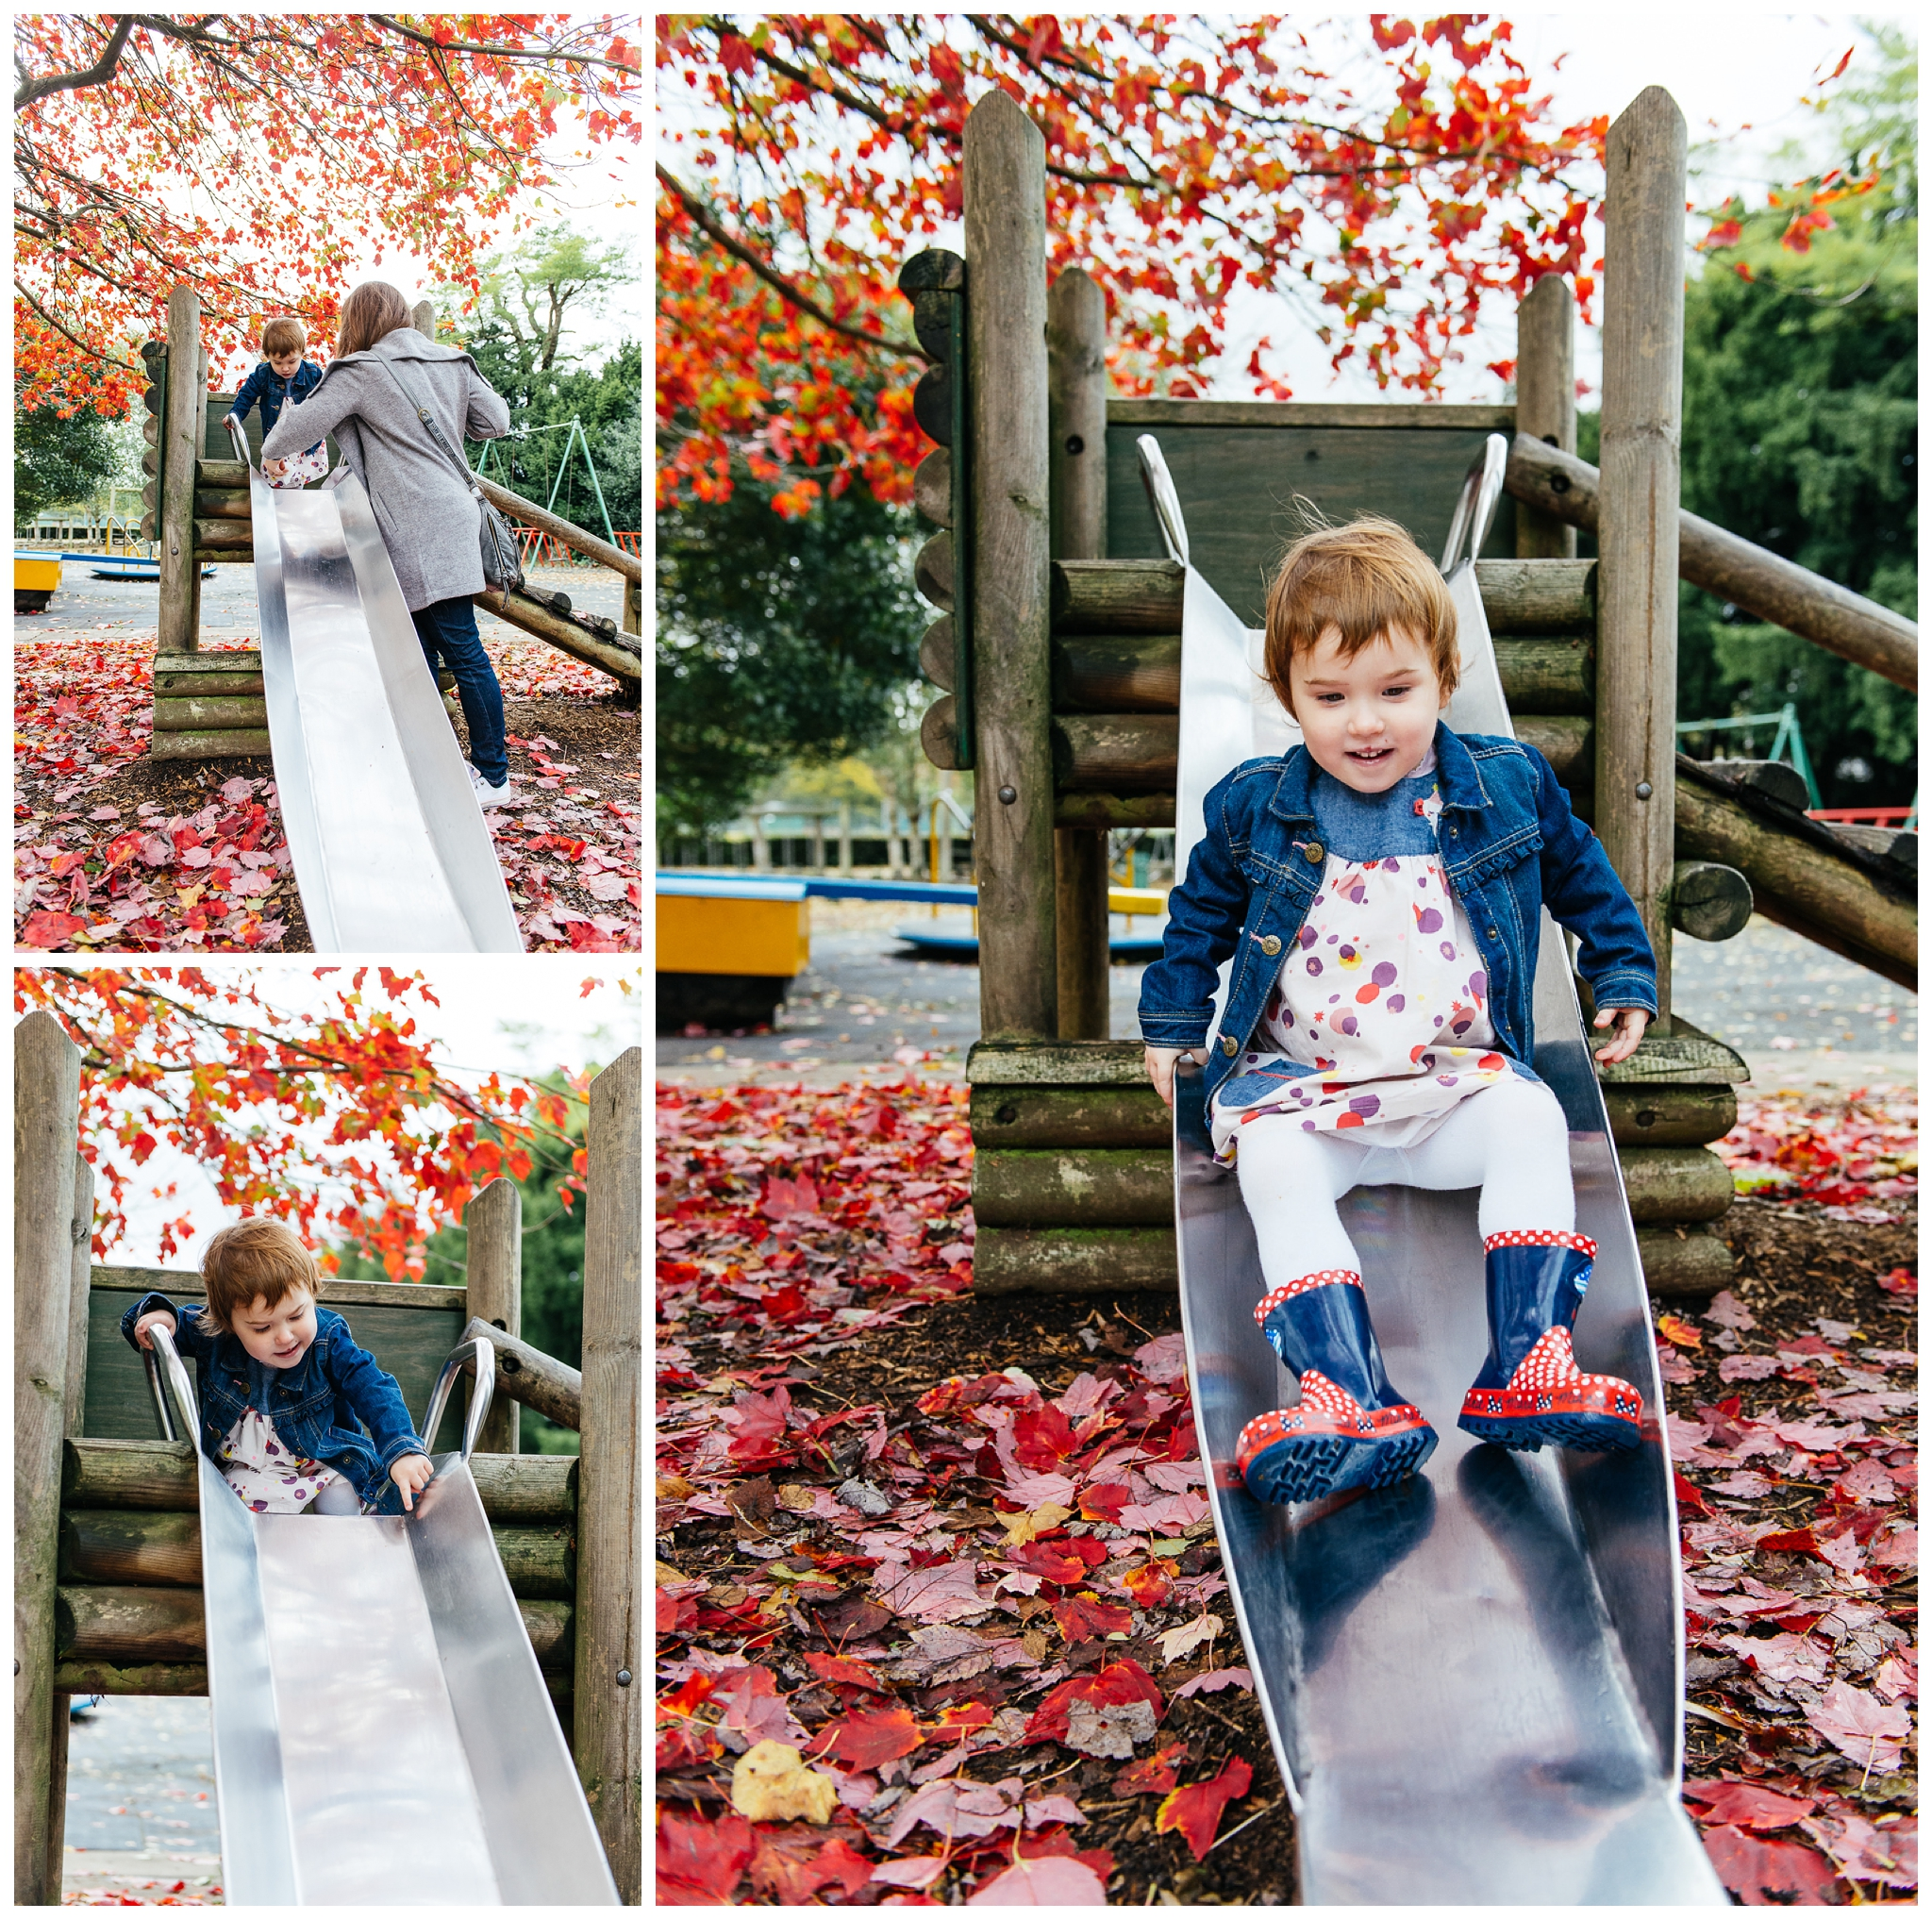 Autumn-family-portraits-birmingham-photographer_0008.jpg